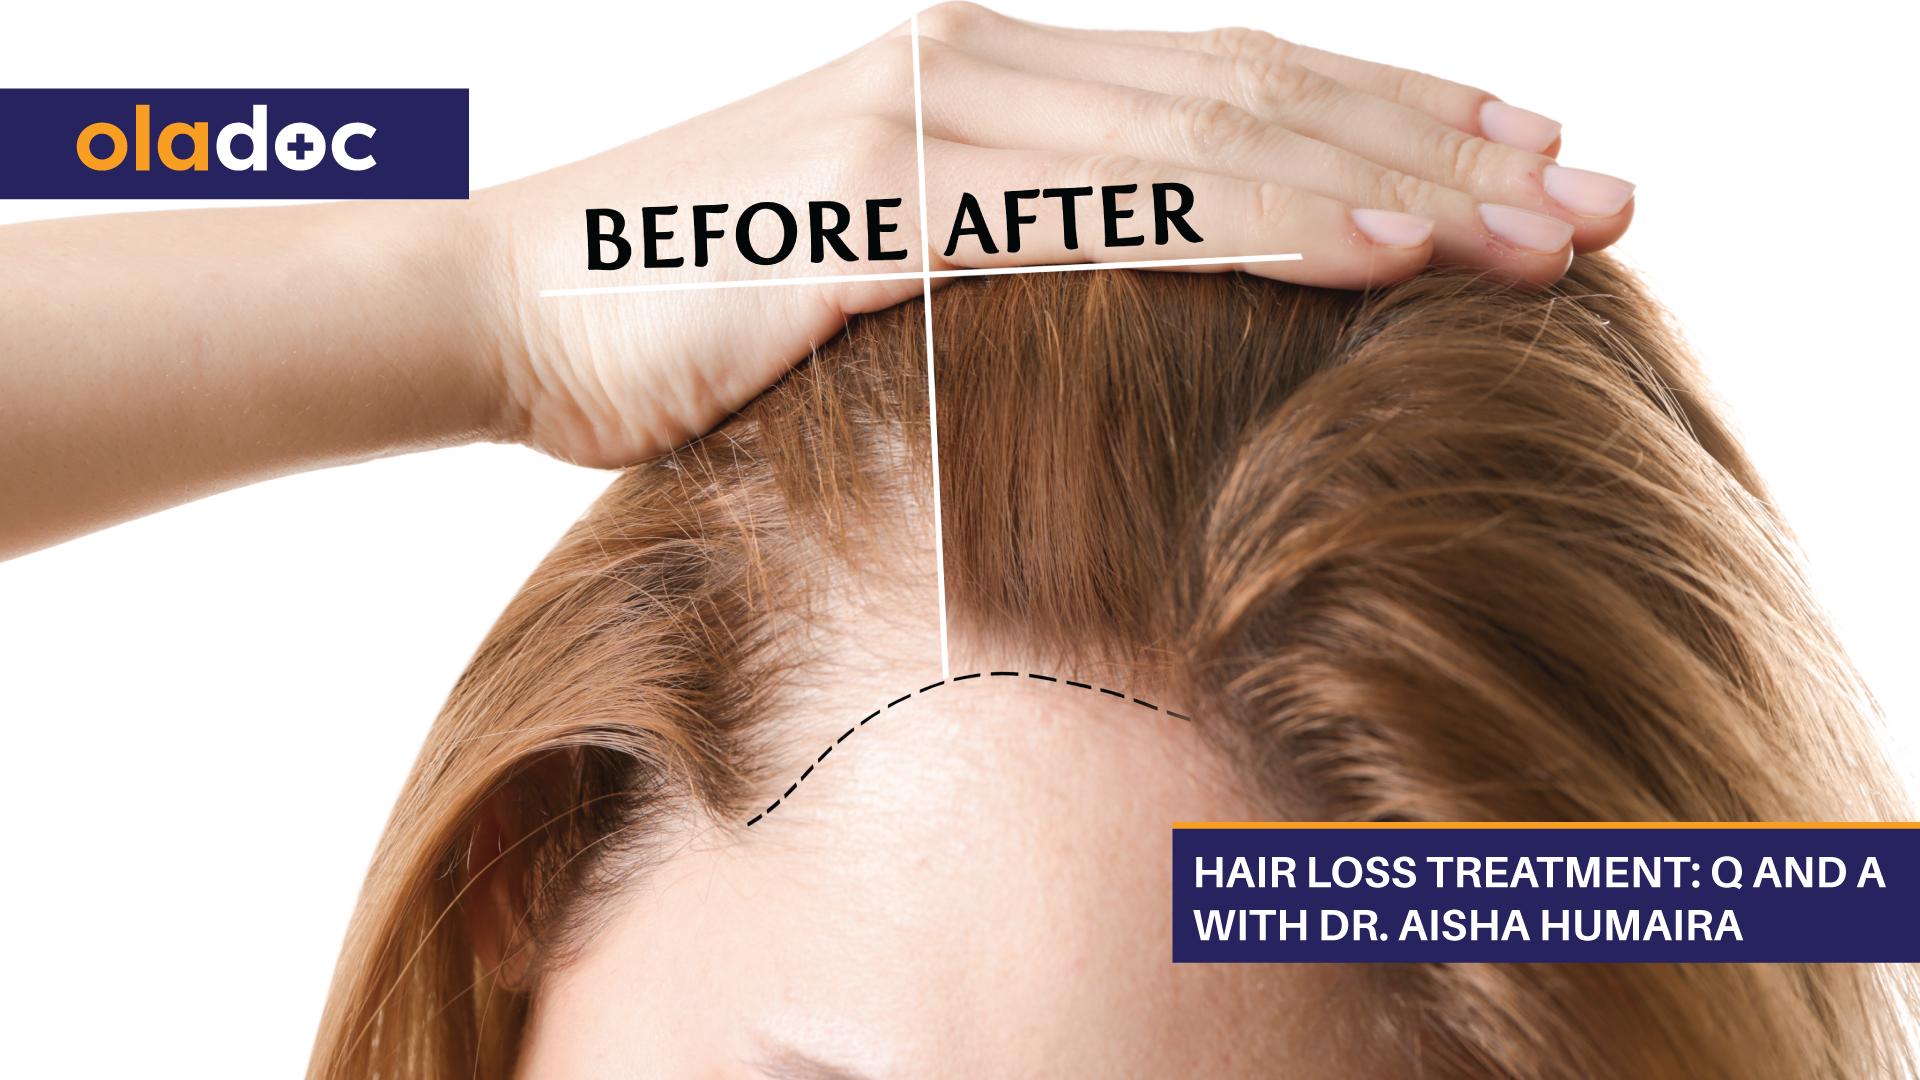 Hair Loss Treatment: Q And A With Dr. Aisha Humaira